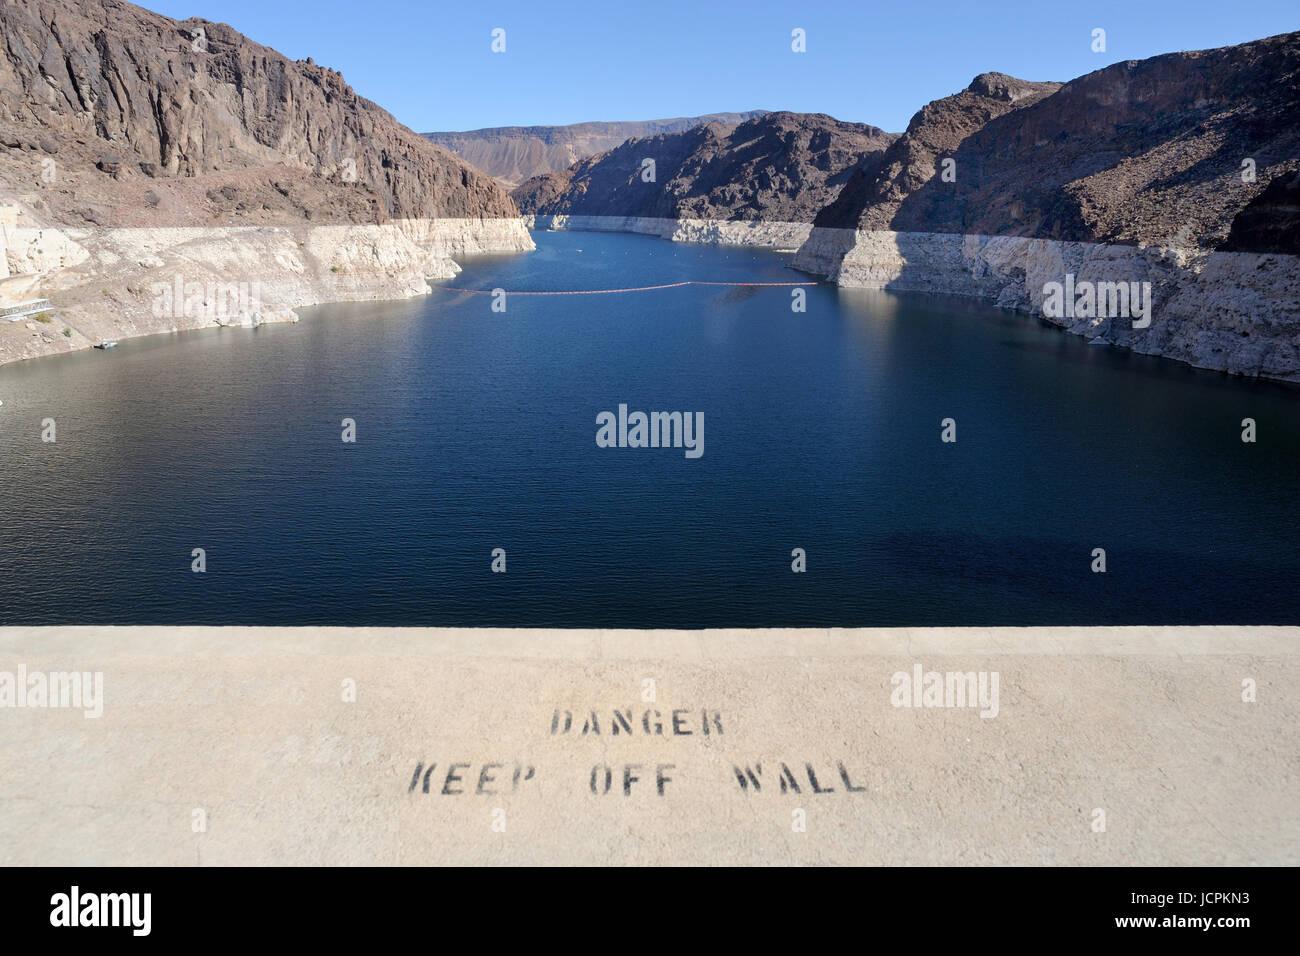 Warning notice  on parapet at Lake Mead from the Hoover Dam Arizona/Nevada border USA - Stock Image